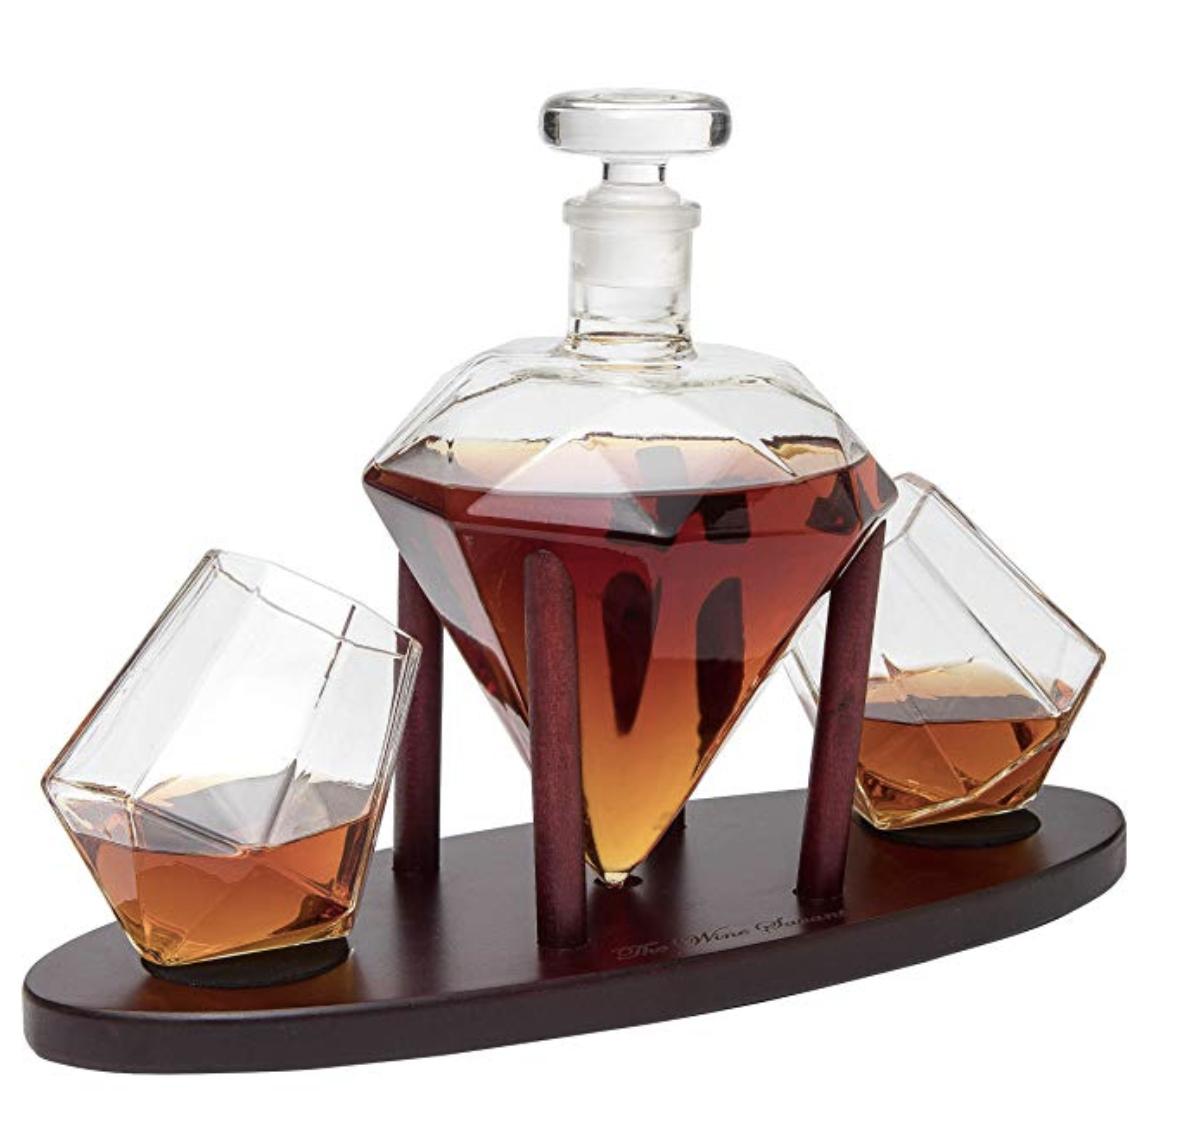 Personalized Diamond Whiskey Decanter with 2 Diamond Glasses — Say Thank U